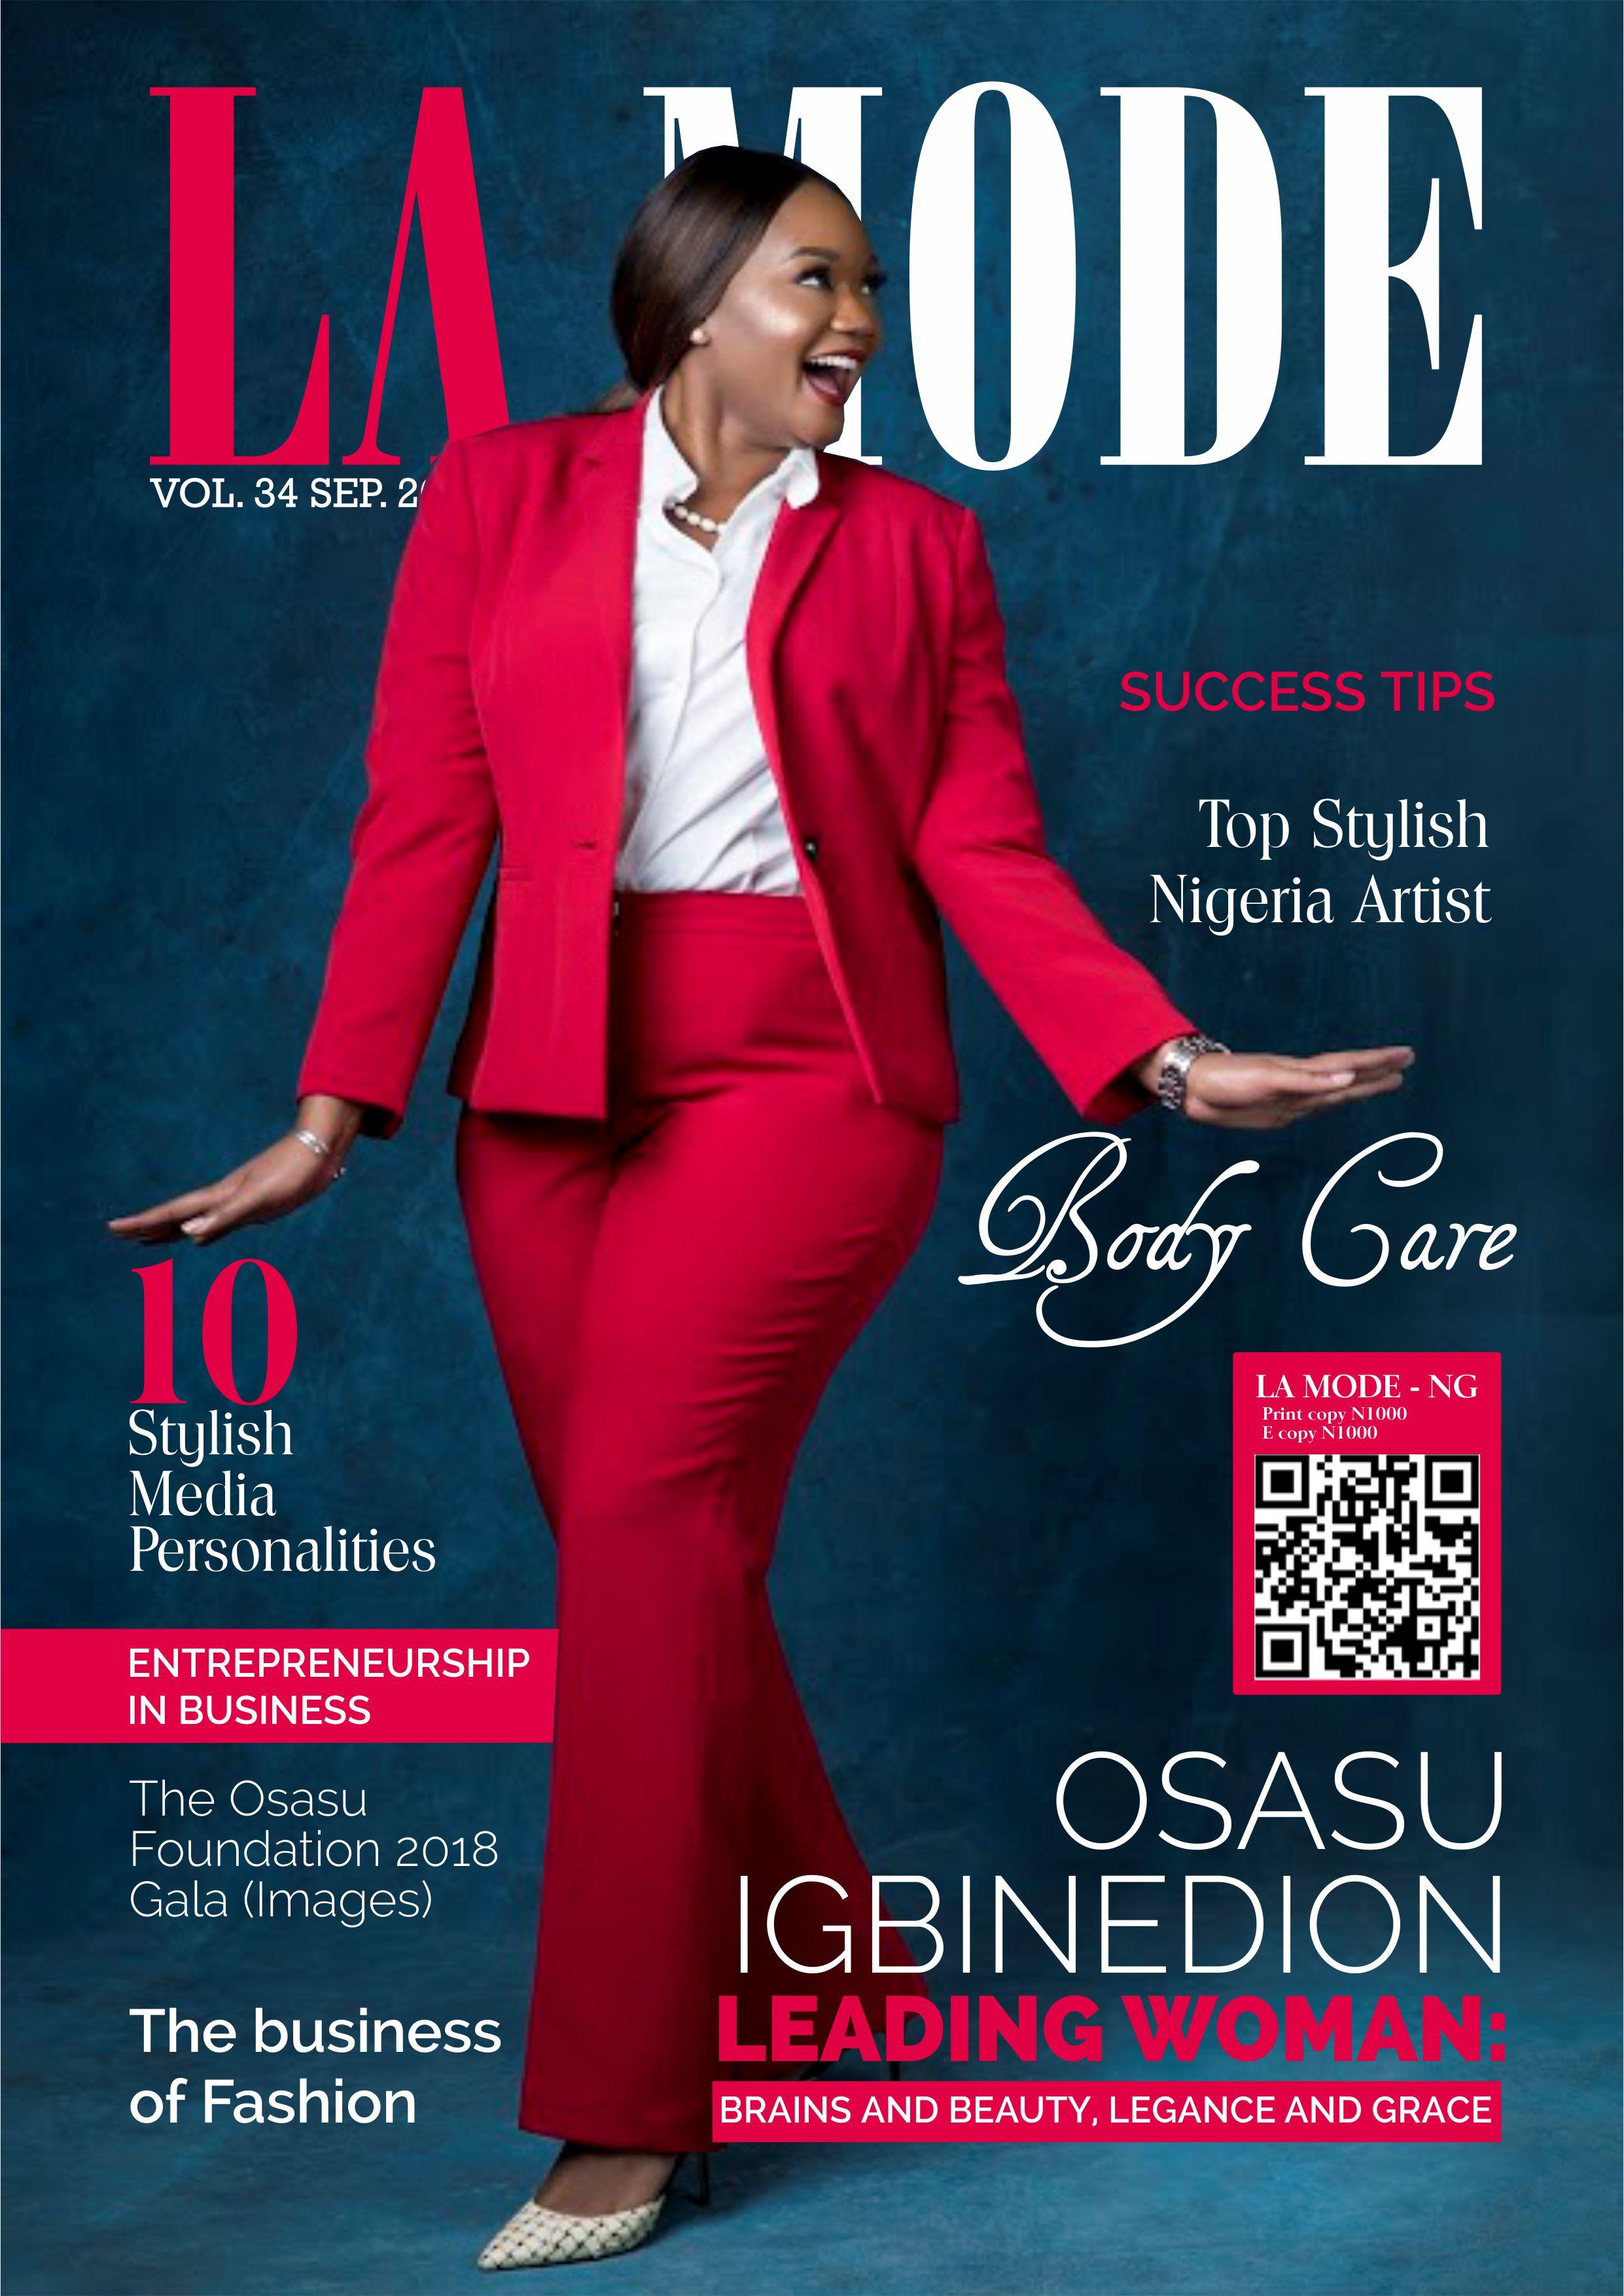 magazine igbinedion mode september issue personality covers beauty lamodespot brains star onobello